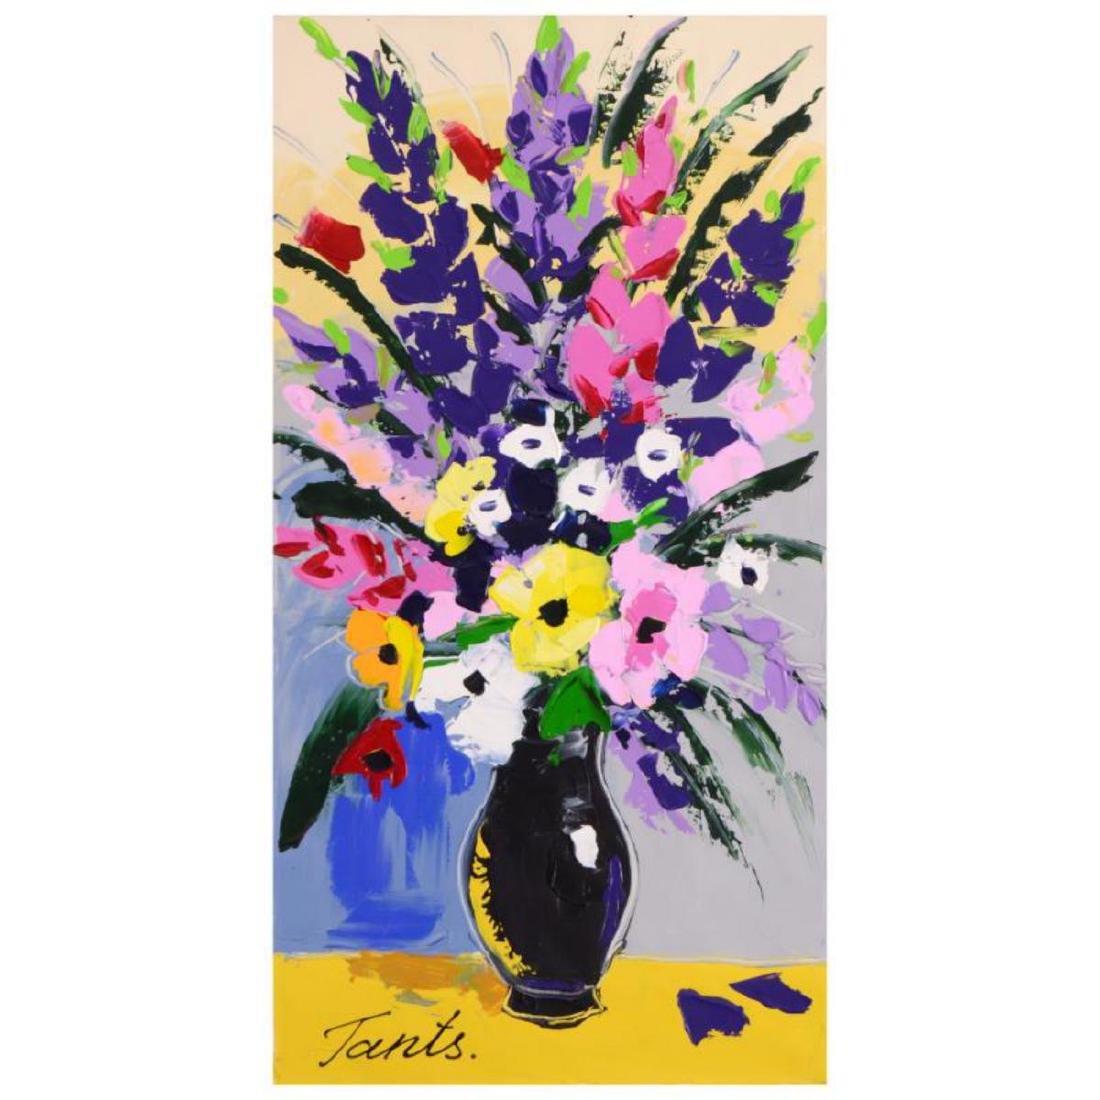 Lena Tants - Original Acrylic Painting on Canvas, Hand